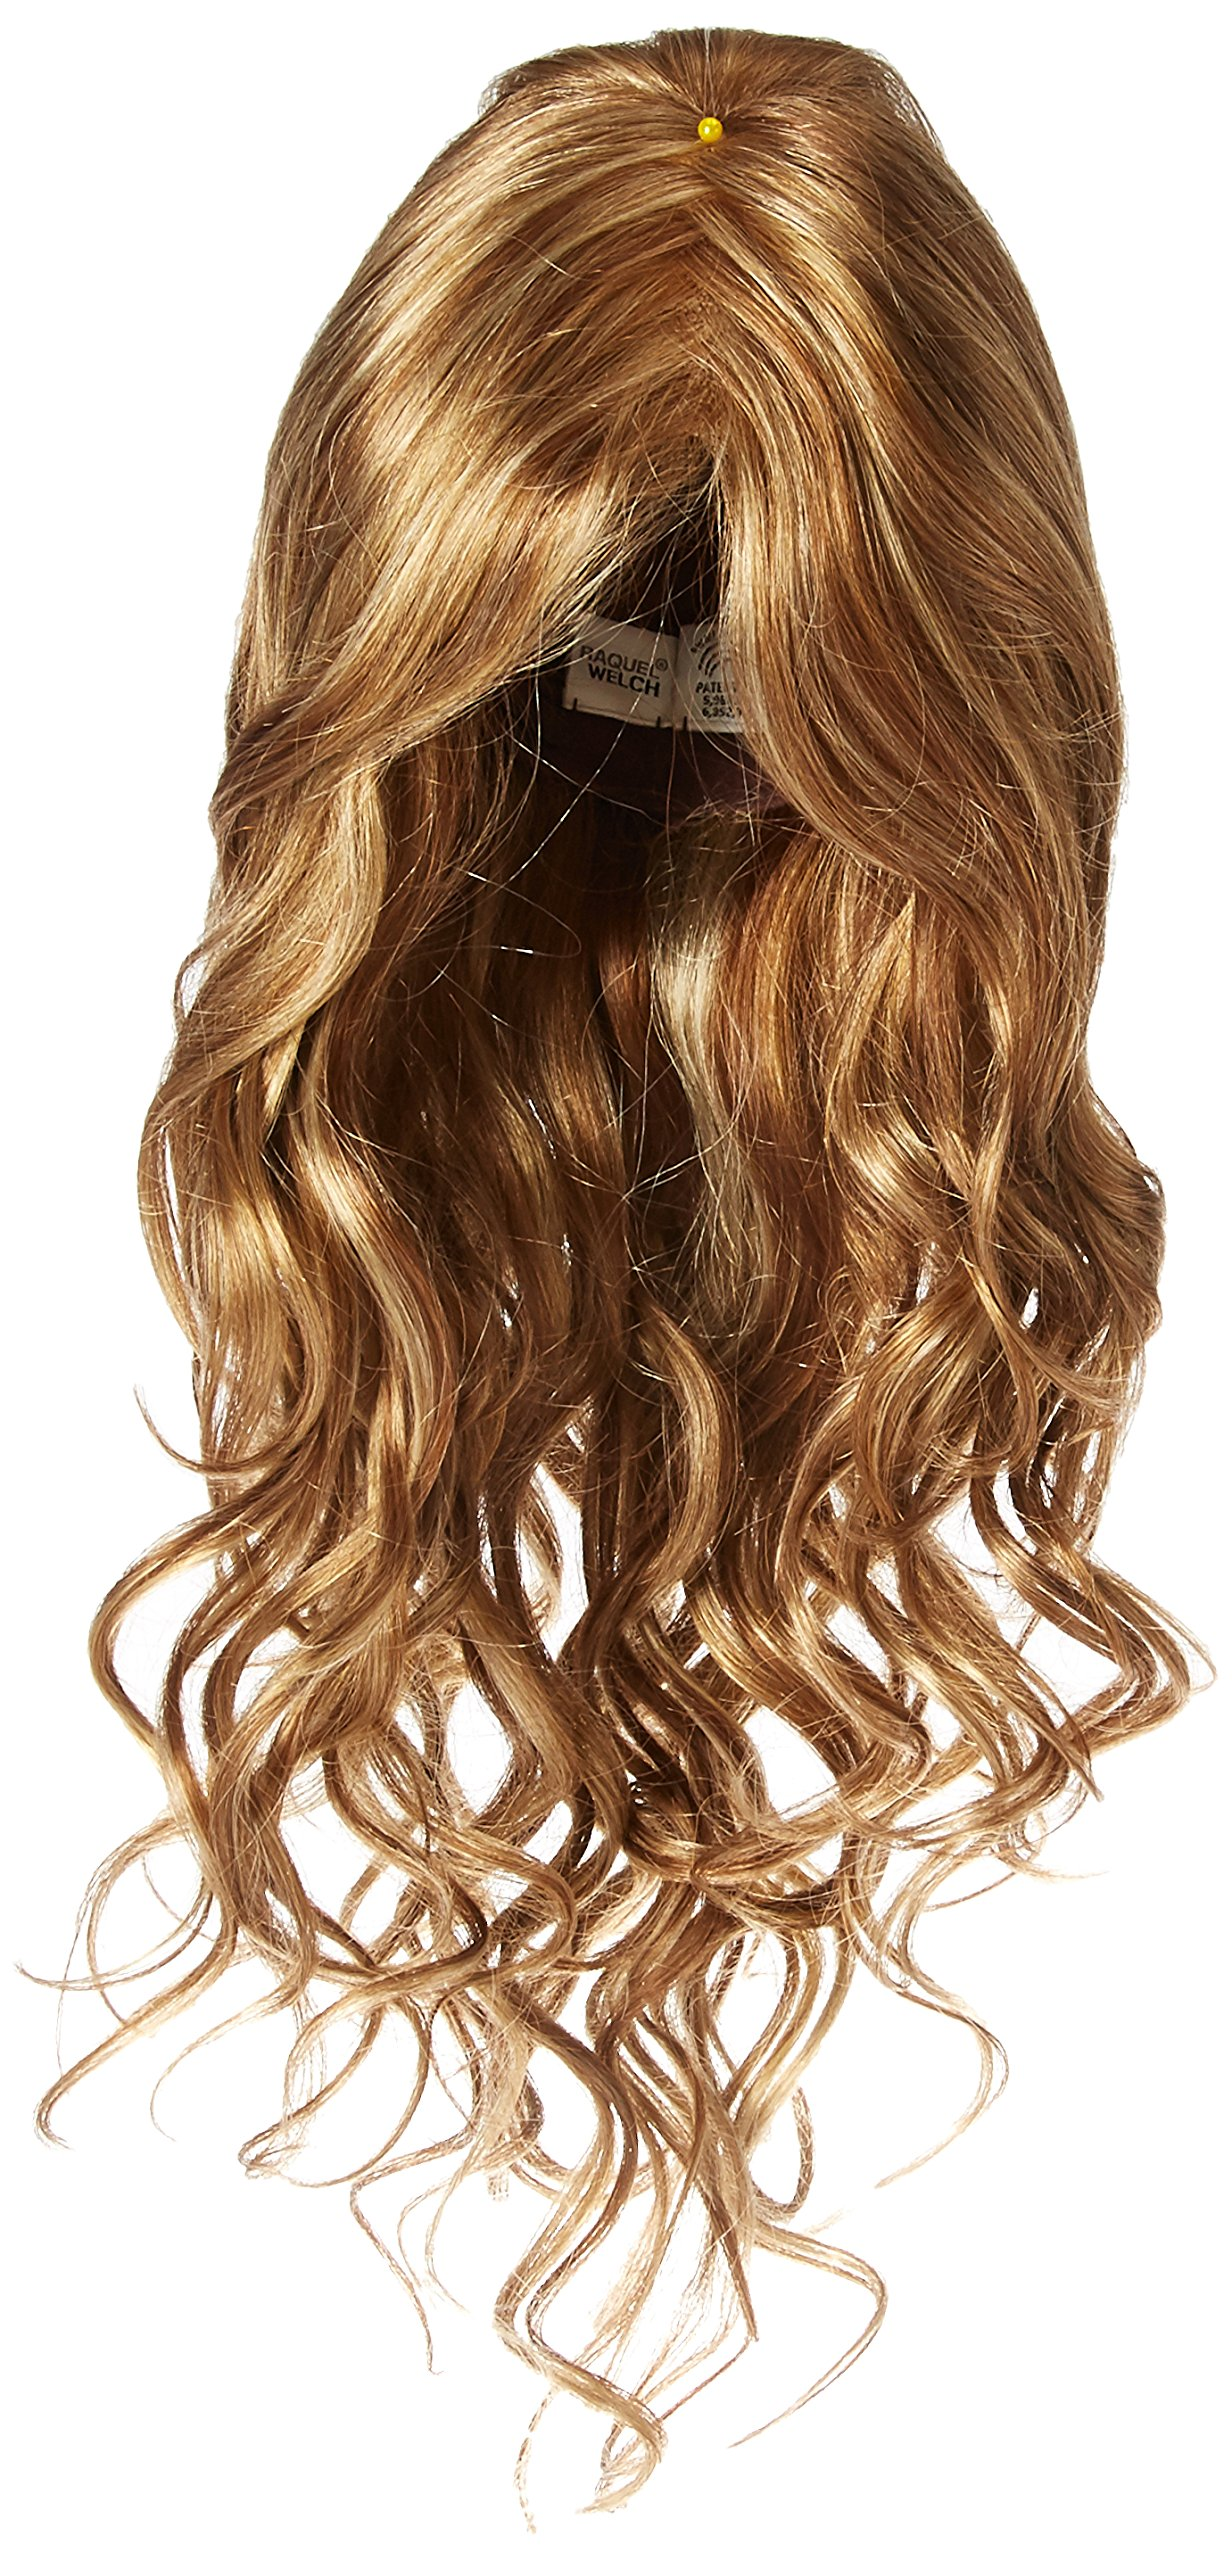 Raquel Welch Haiear Downtime Long And Luscious Hair Wig, R14/25 Honey Ginger by Hairuwear by Hair u wear